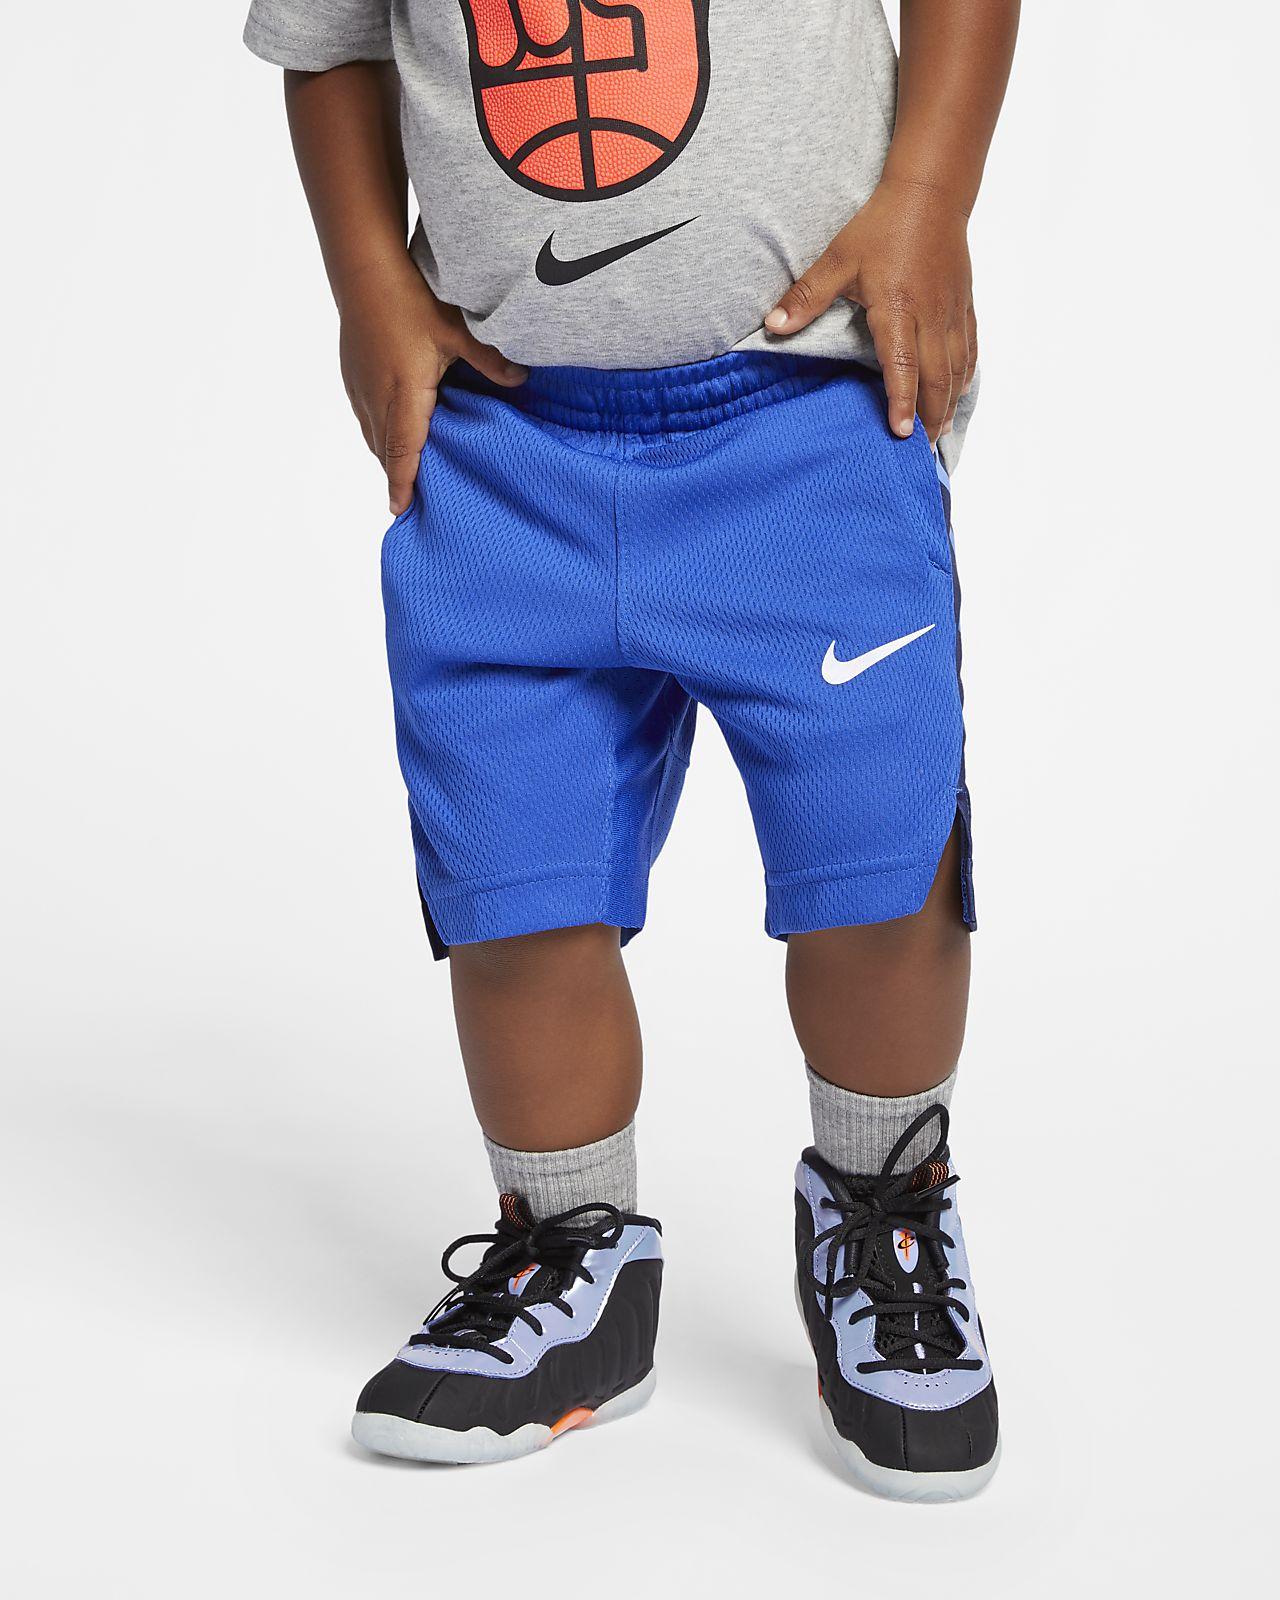 Nike Elite Infant/Toddler Striped Shorts